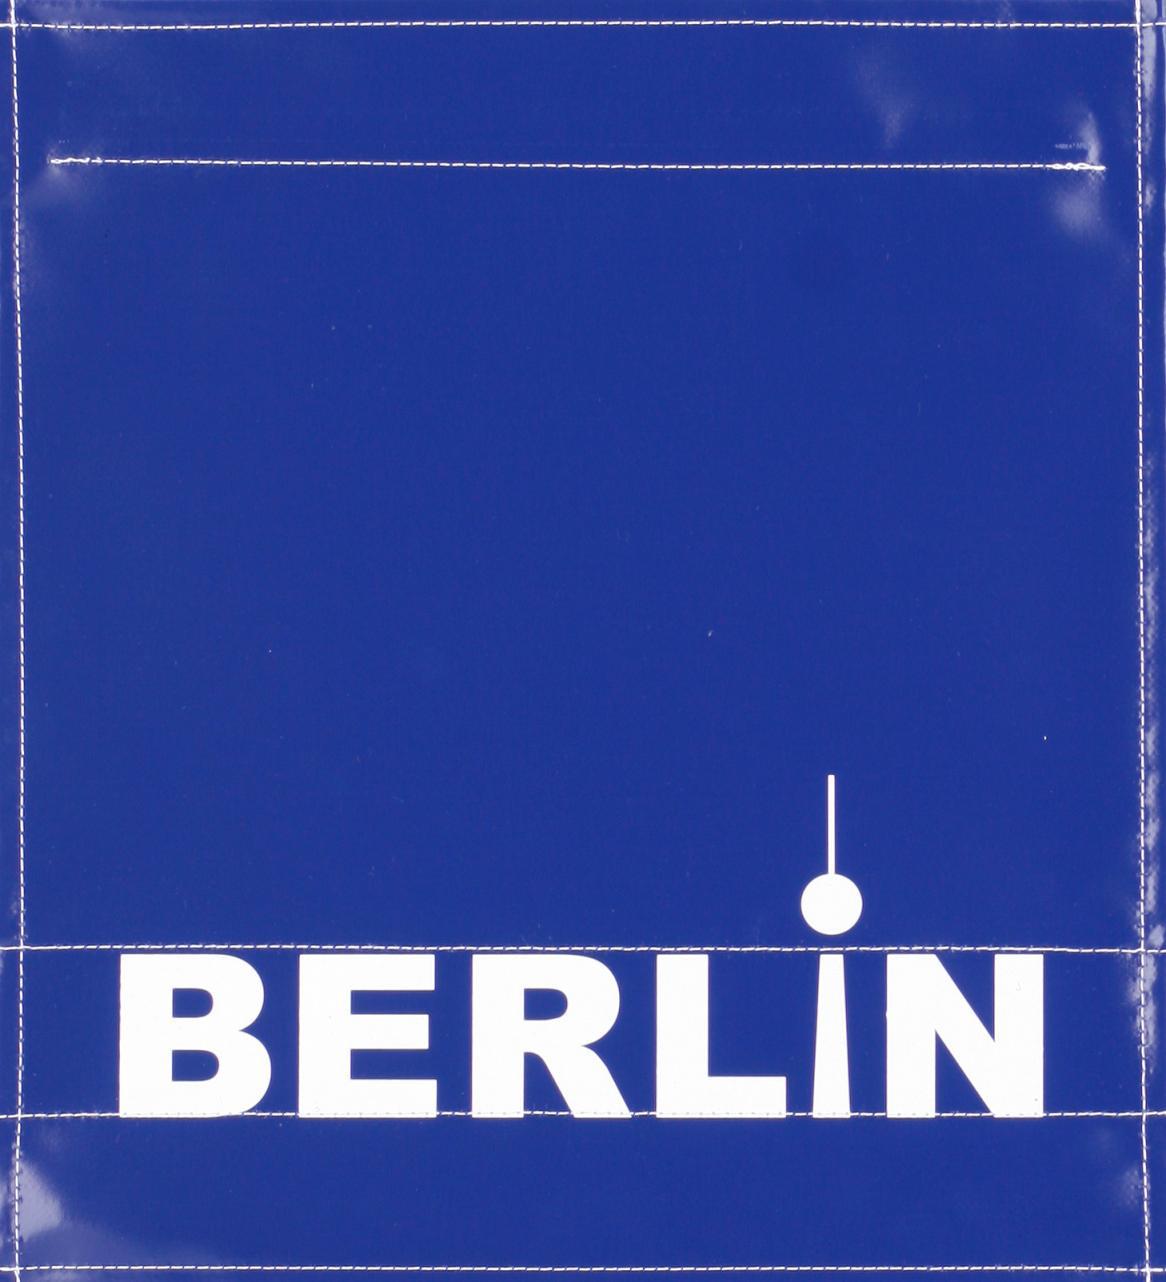 Berlin dunkelblau (mittel)